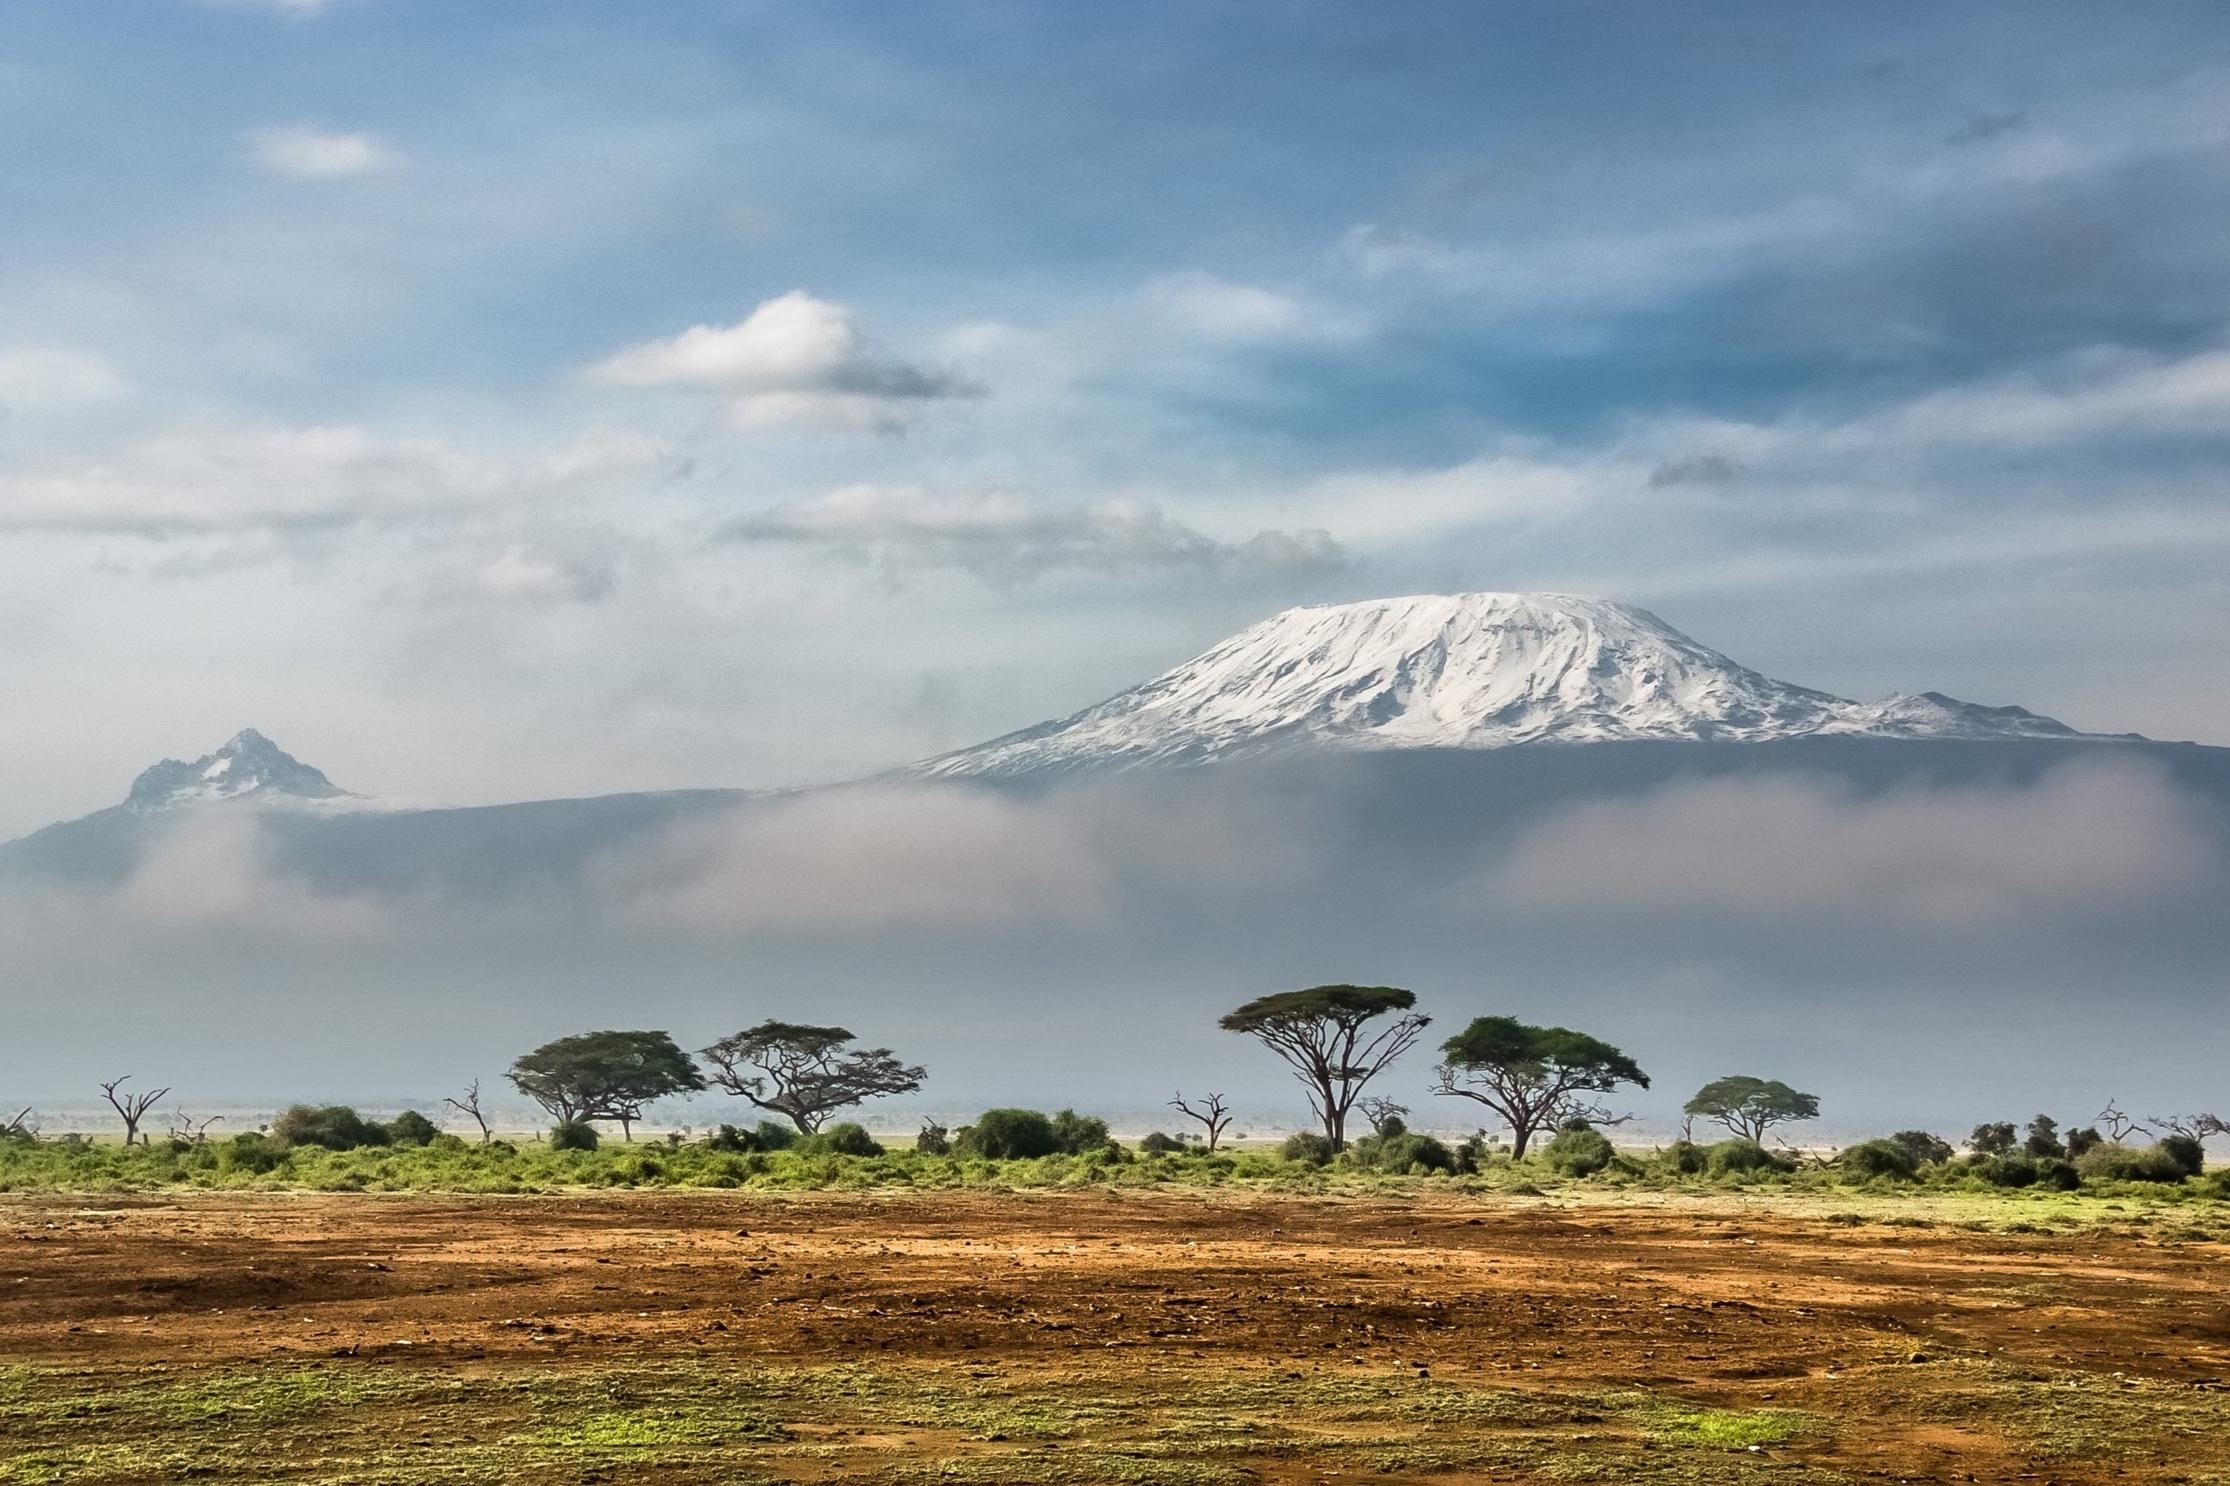 Kilimanjaro%2B3-221501-unsplash.jpg